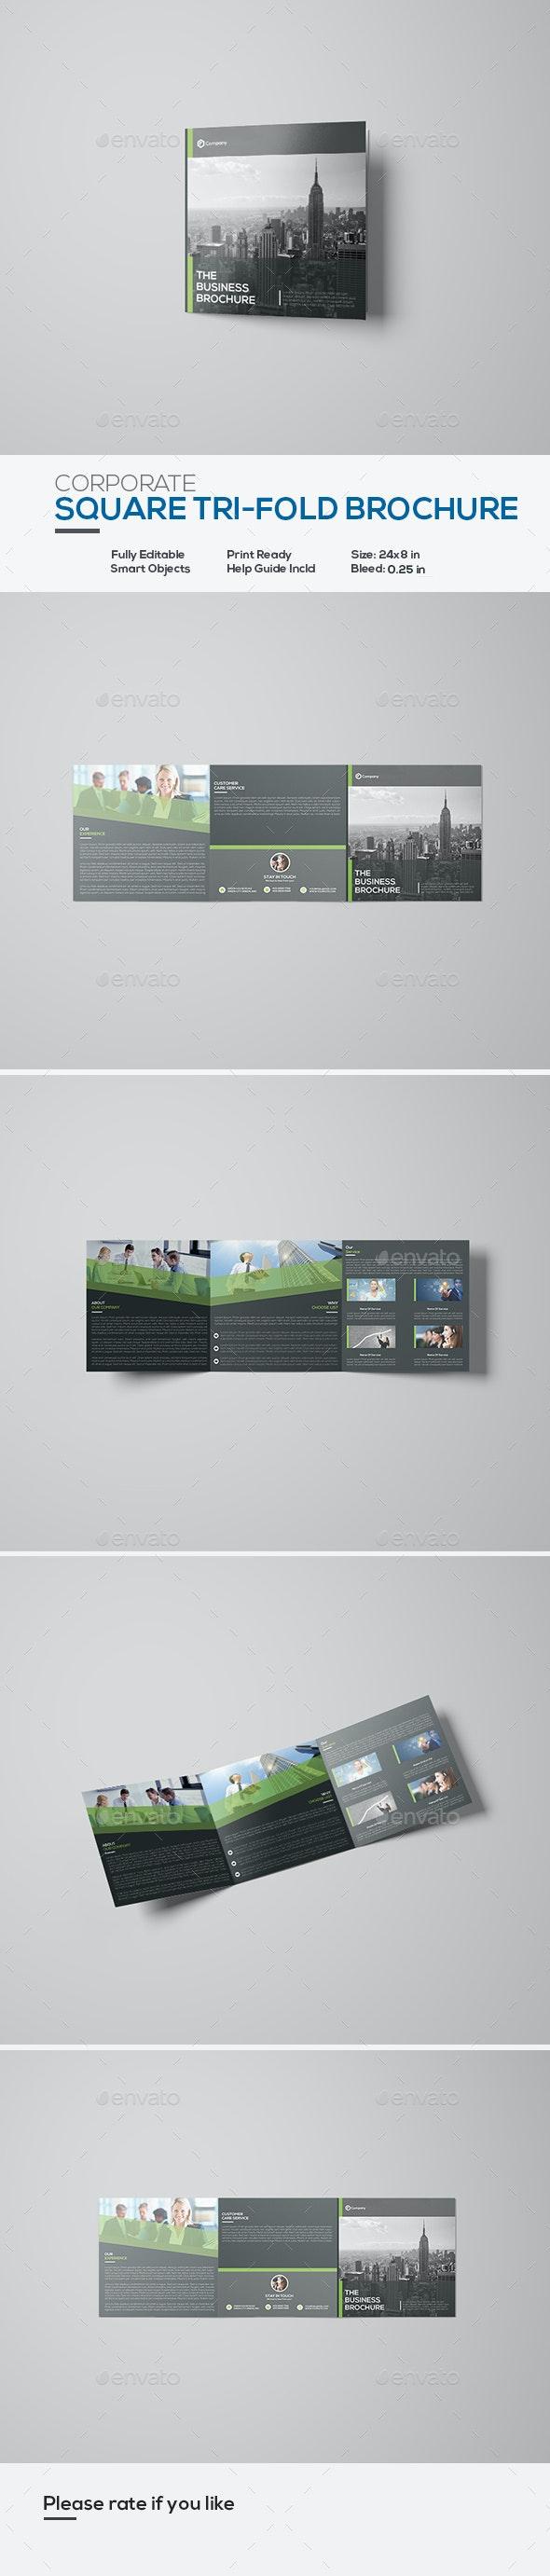 Square Corporate Tri-Fold Brochure - Corporate Brochures